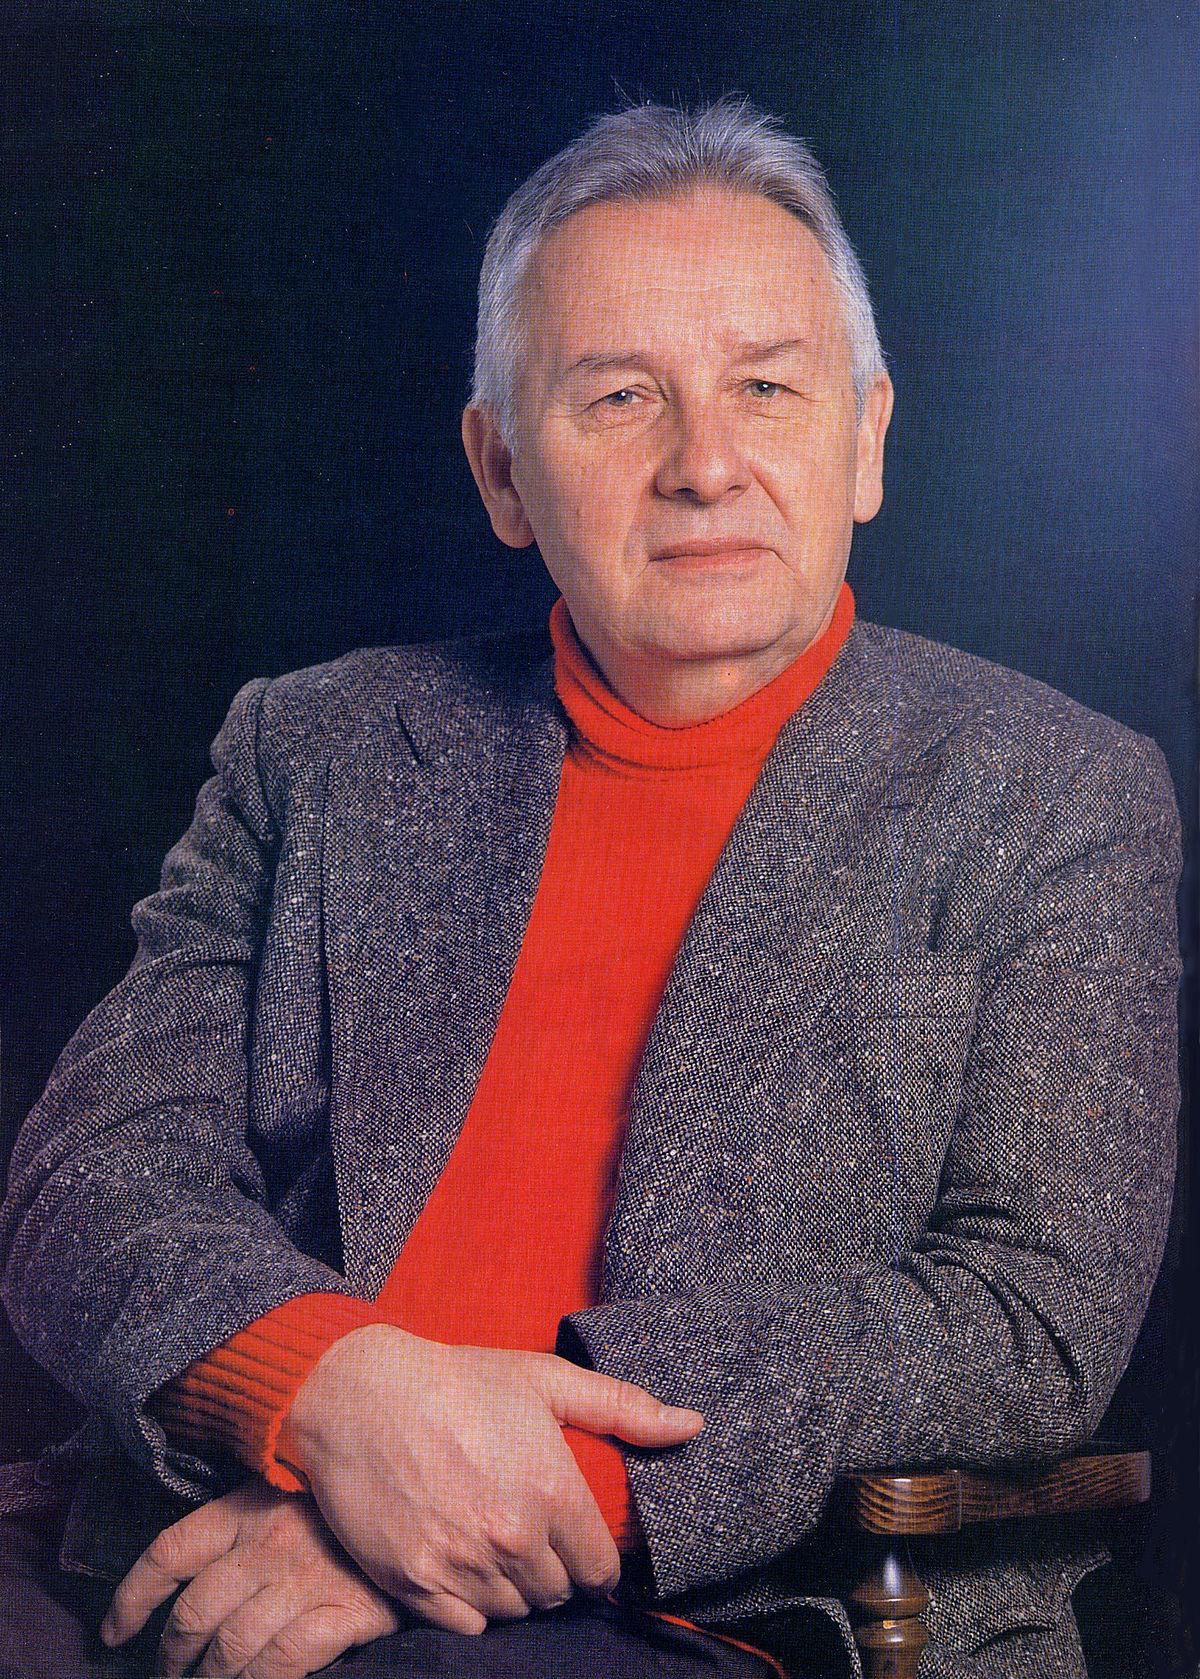 Karlheinz Stockhausen Stockhausen - Les Percussions De Strasbourg - Musik Im Bauch